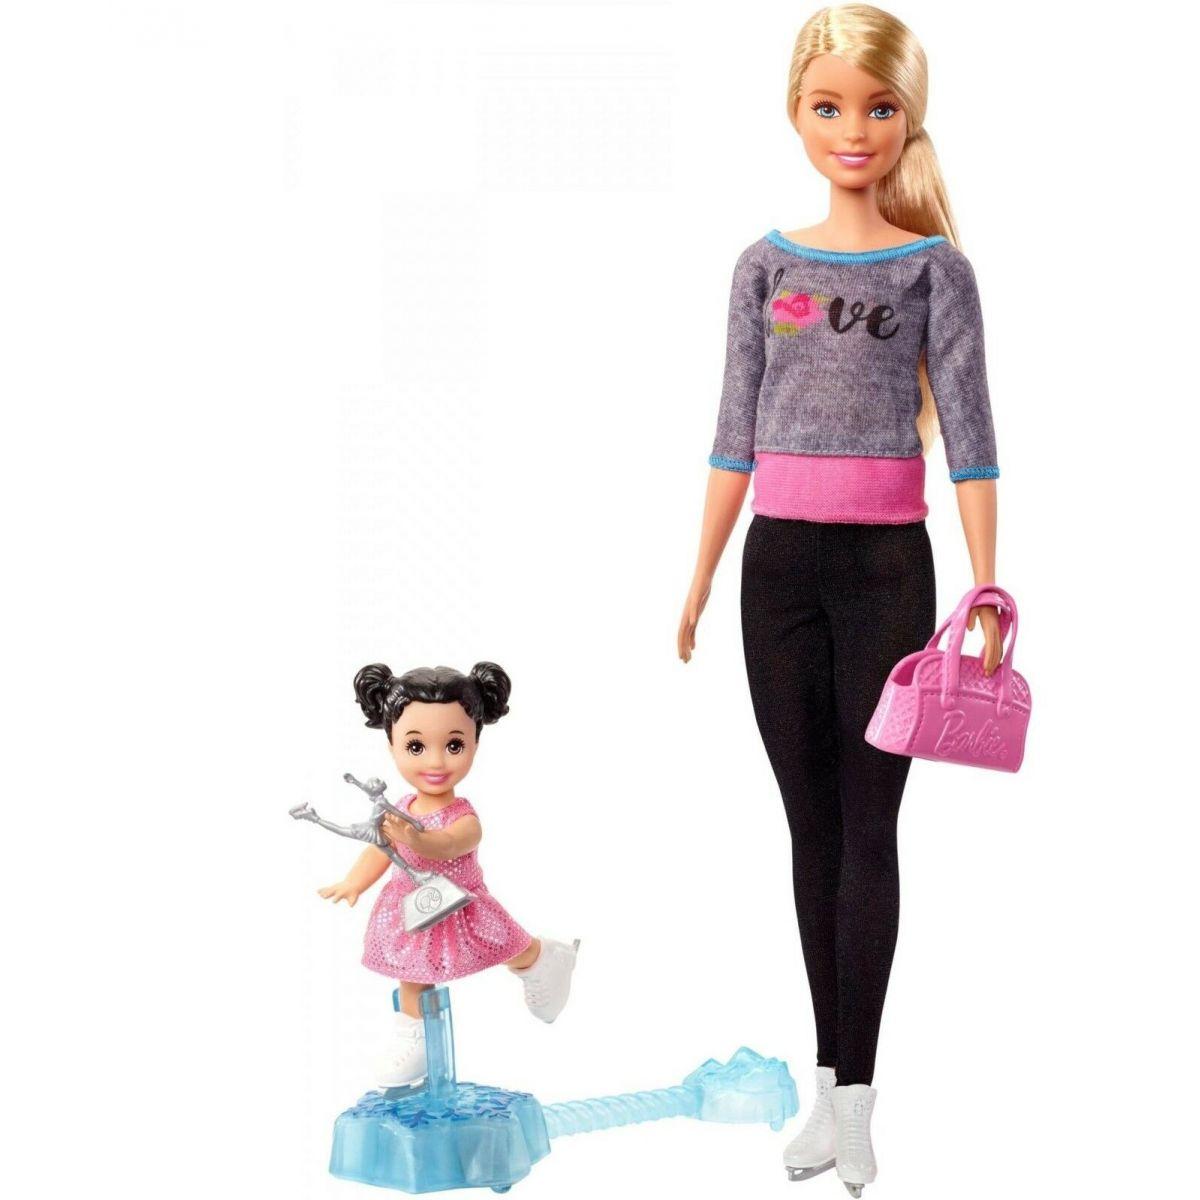 Mattel Barbie Sportovní sada krasobruslařka